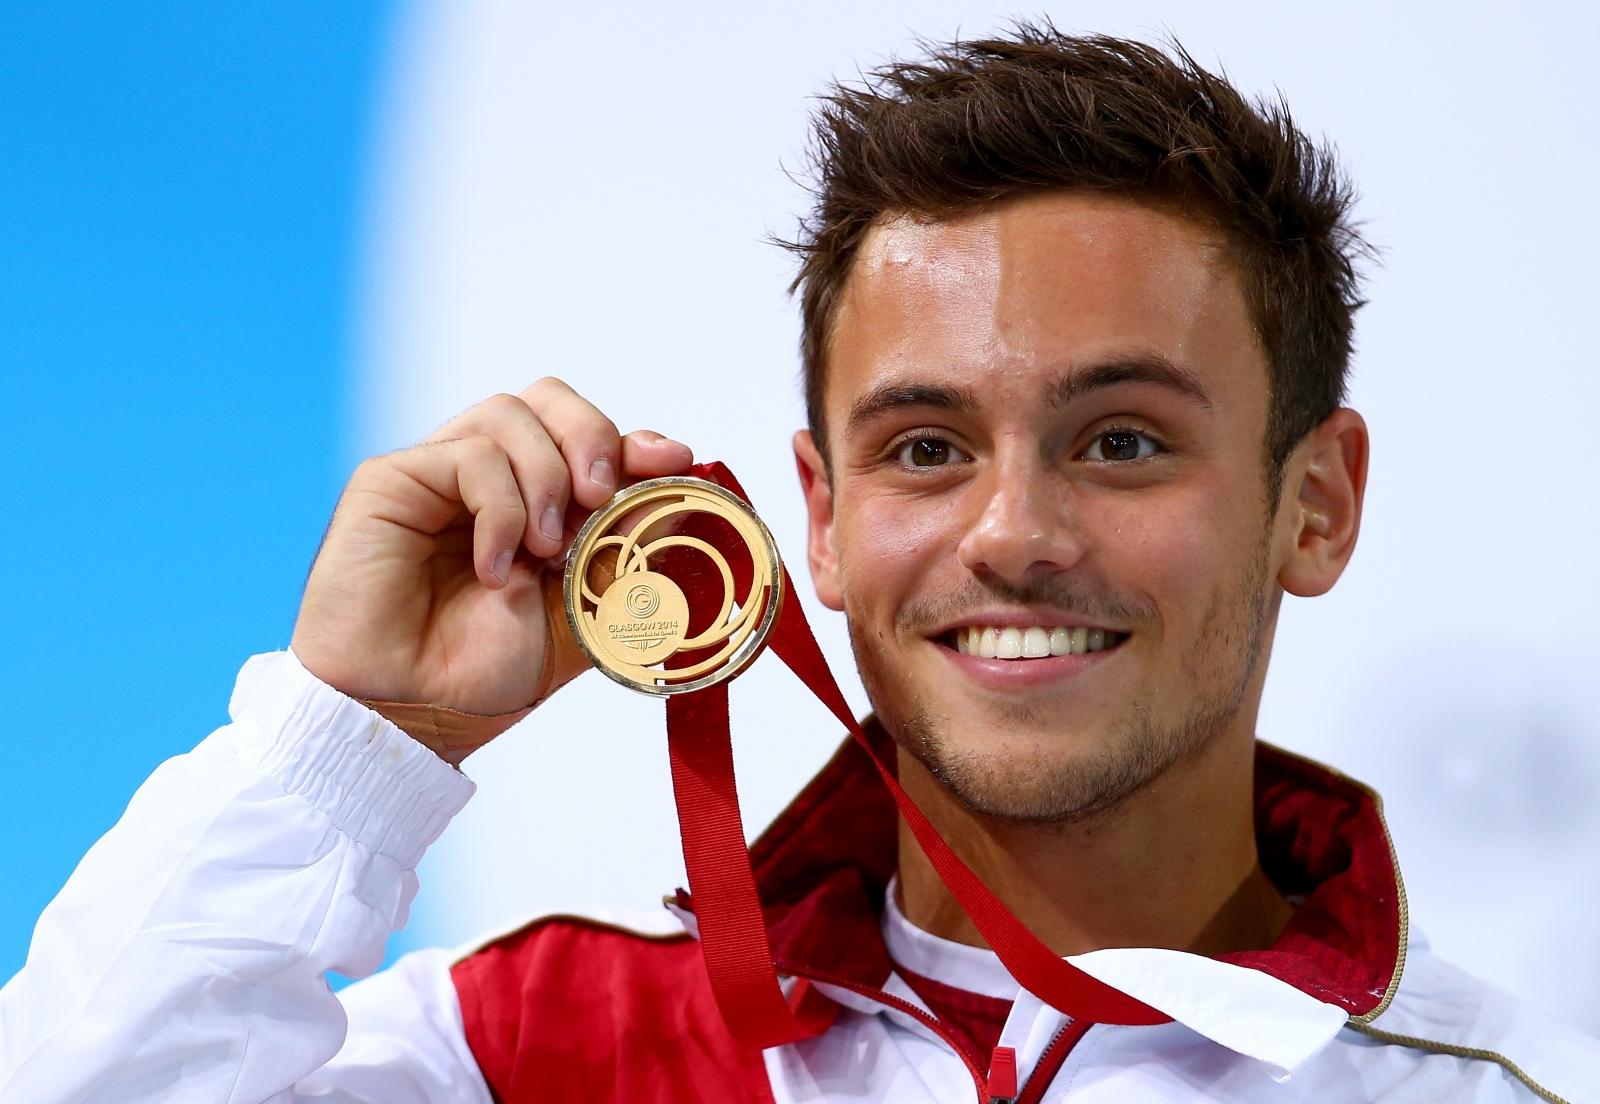 Glasgow 2014 Tom Daley Retains 10m Platform Commonwealth Gold